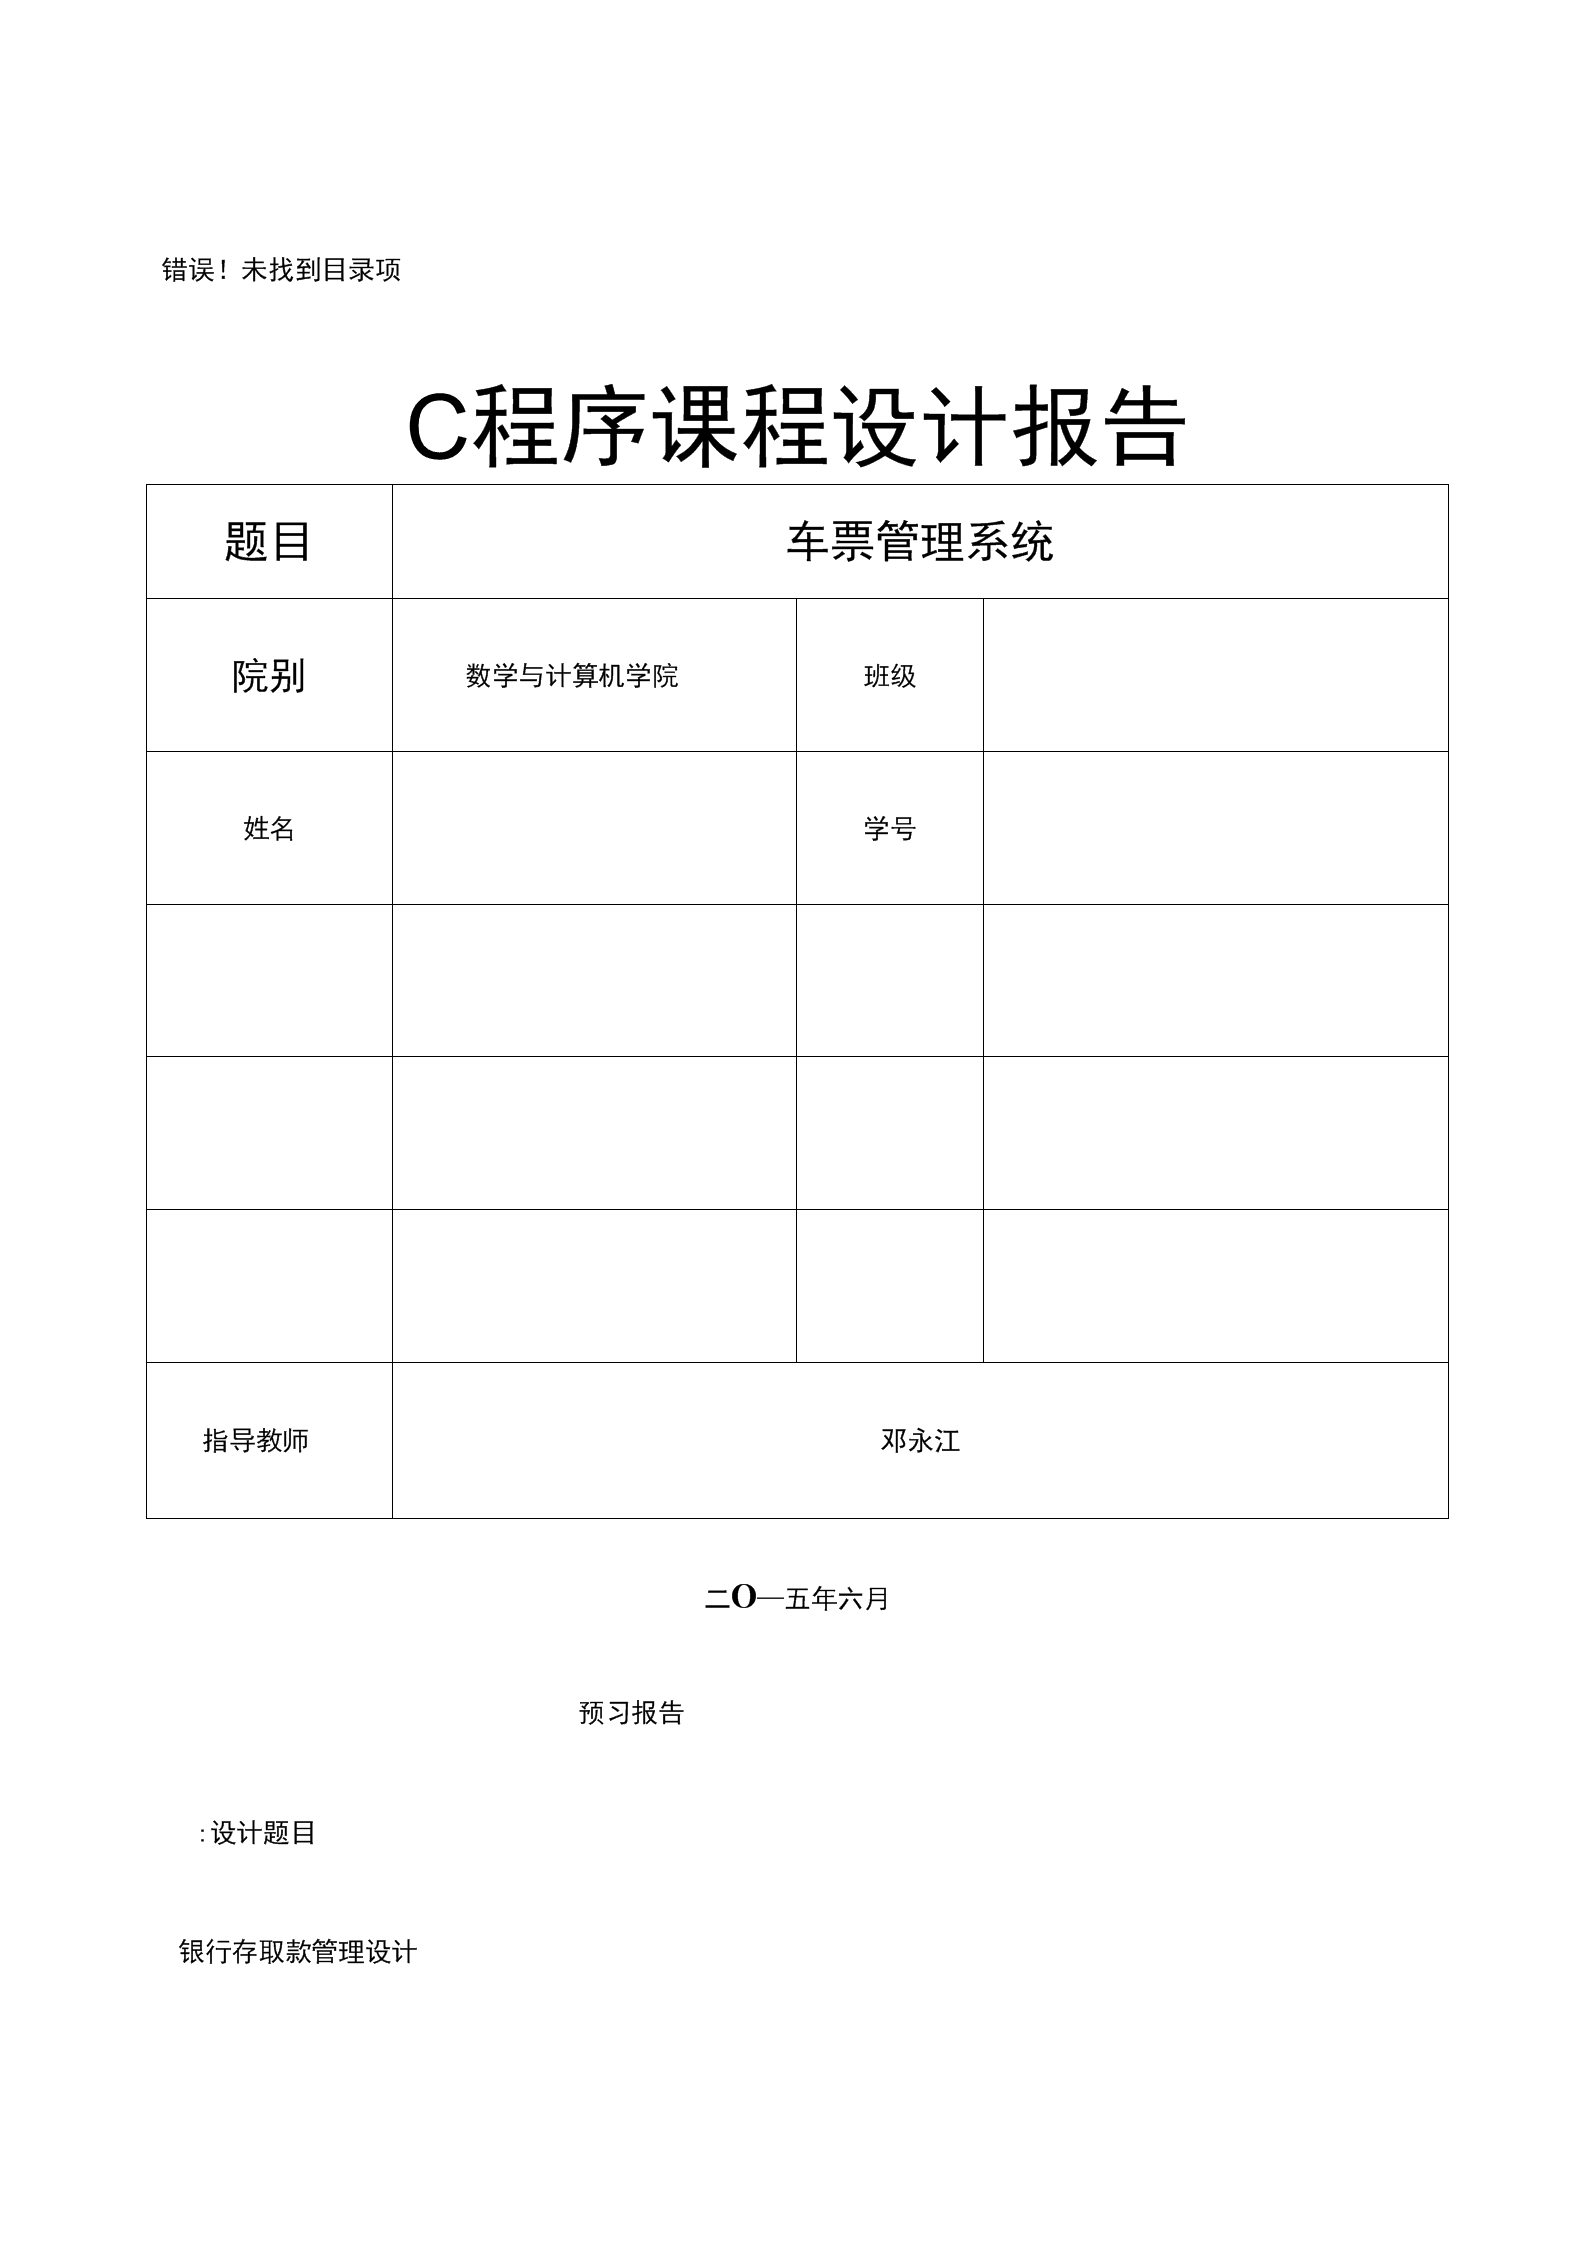 C语言课程设计报告银行存取款管理设计.docx